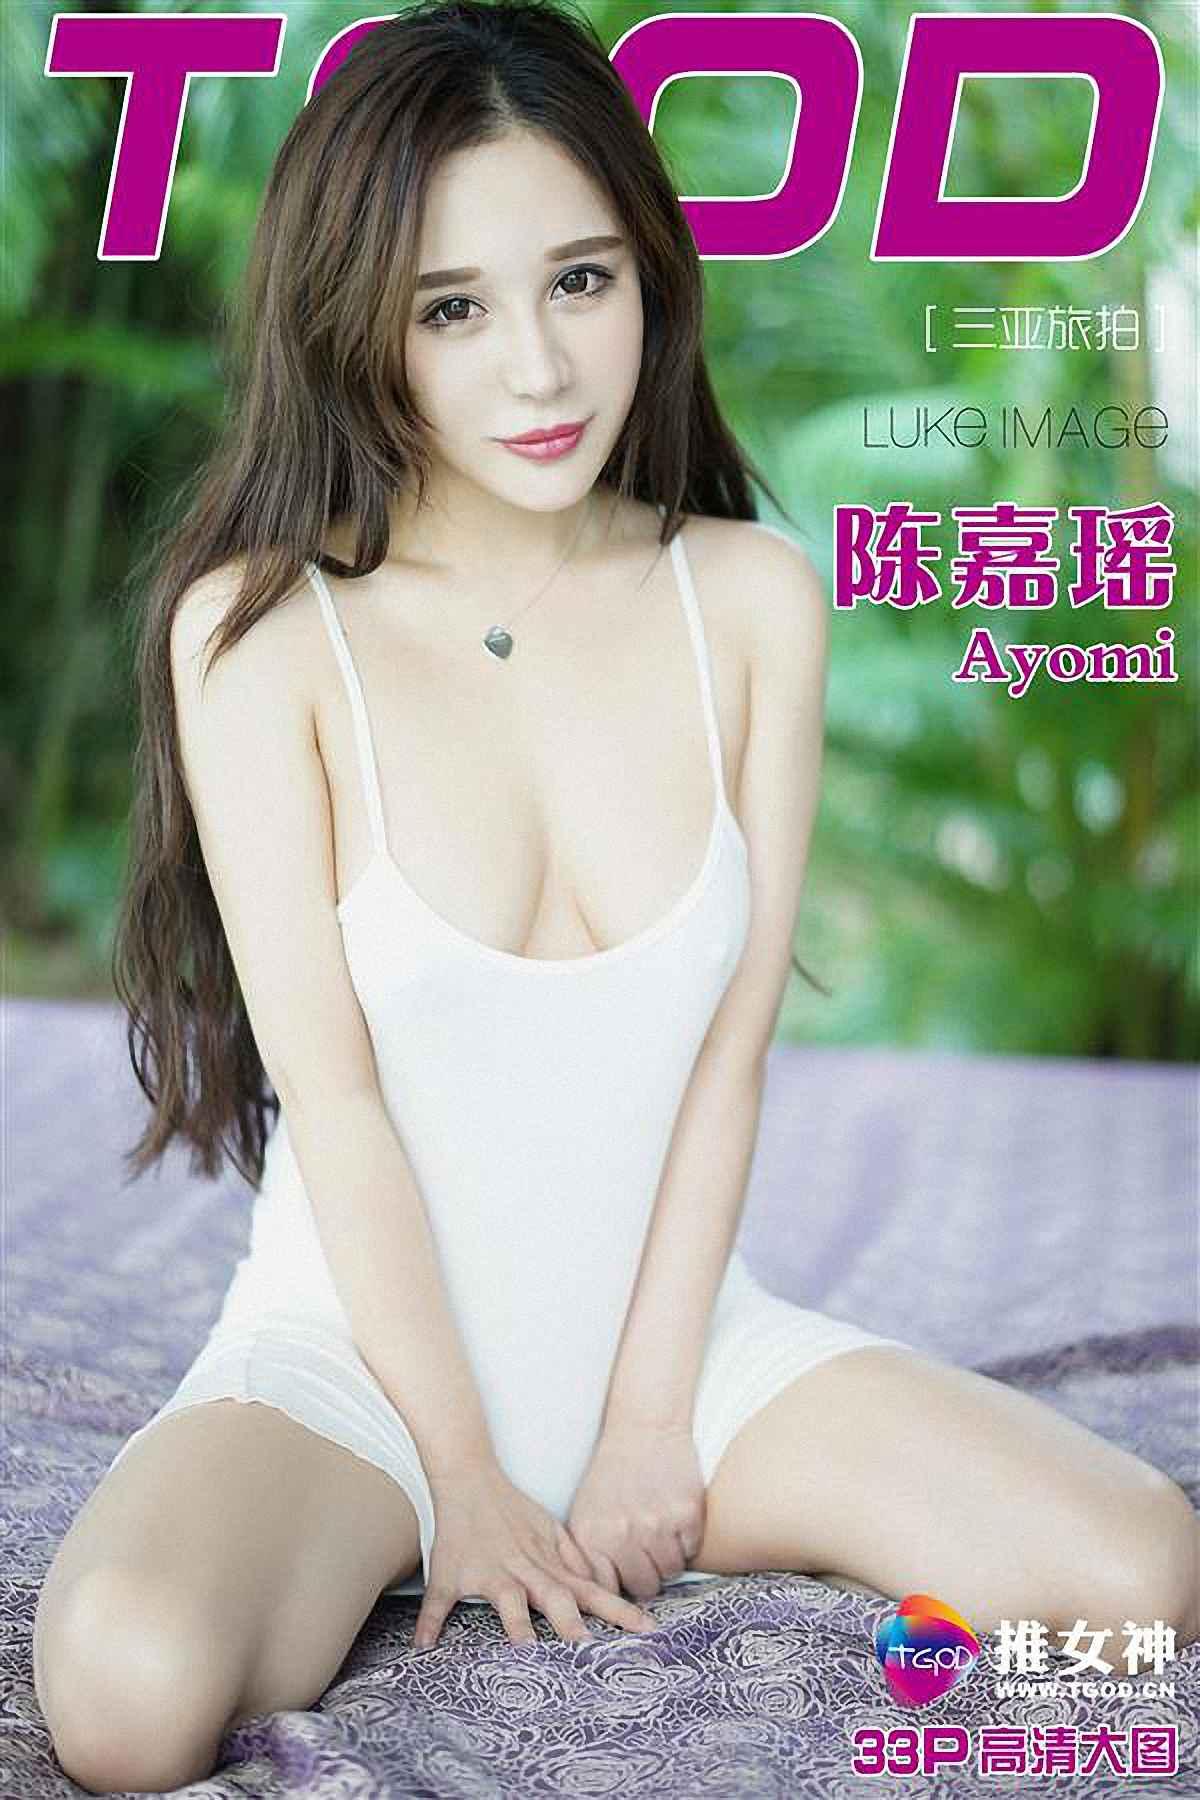 tgod-chenjiayao-001-cover.jpg